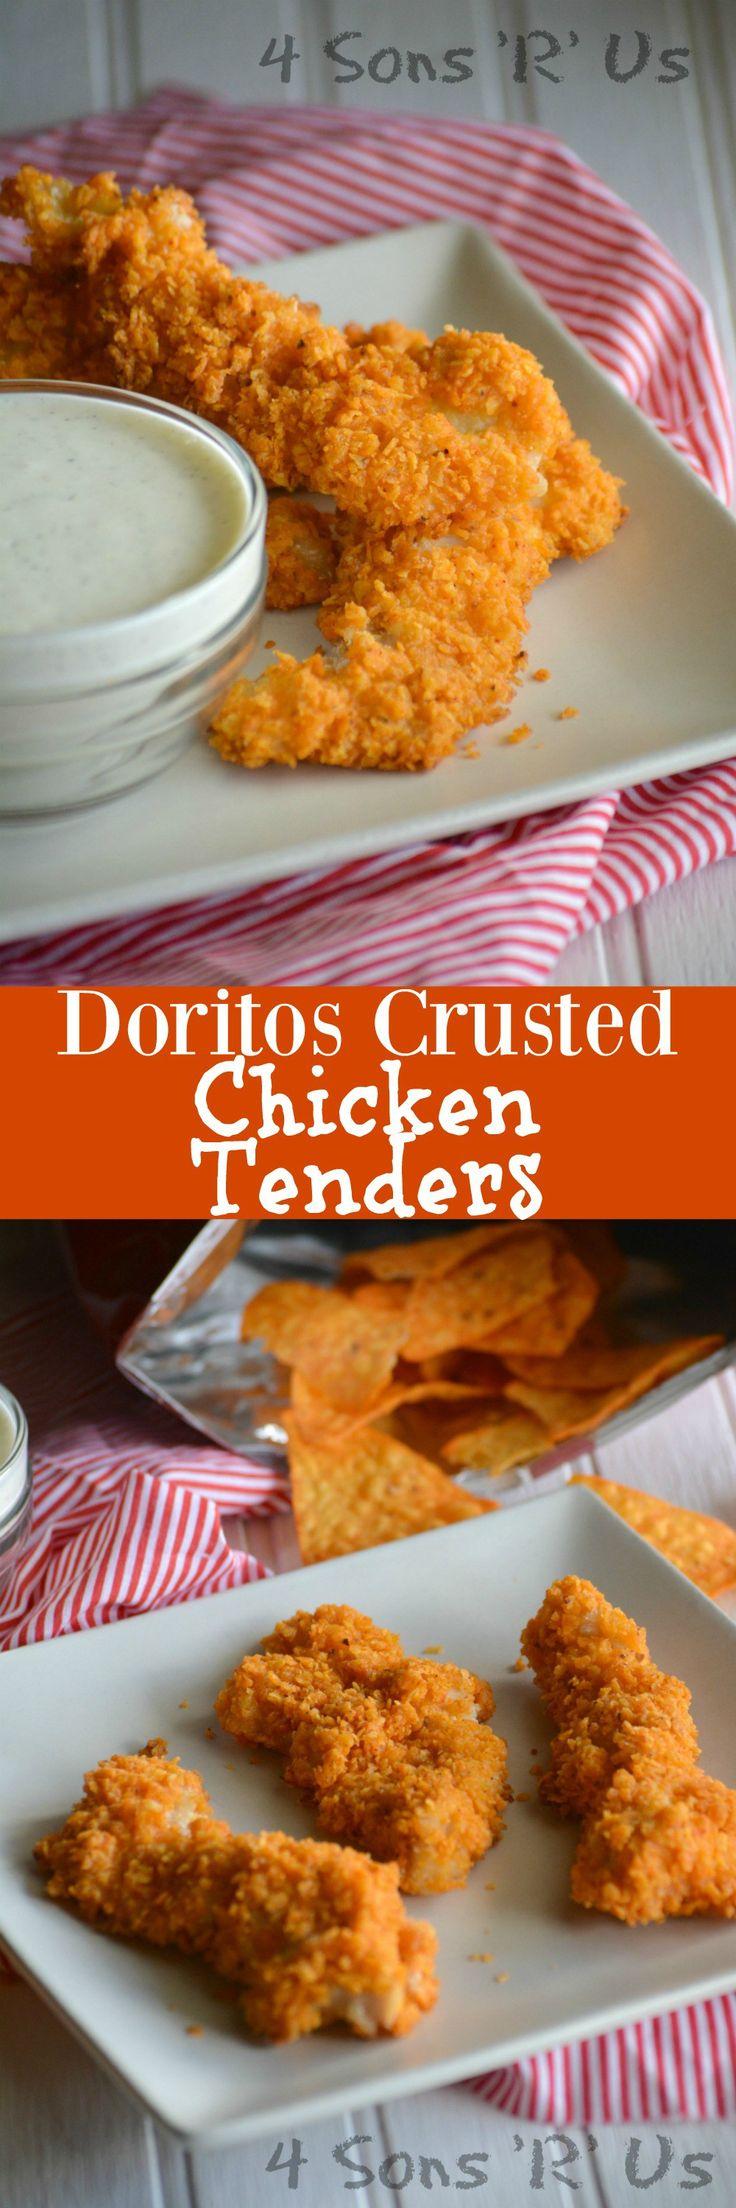 Doritos Crusted Chicken Tenders